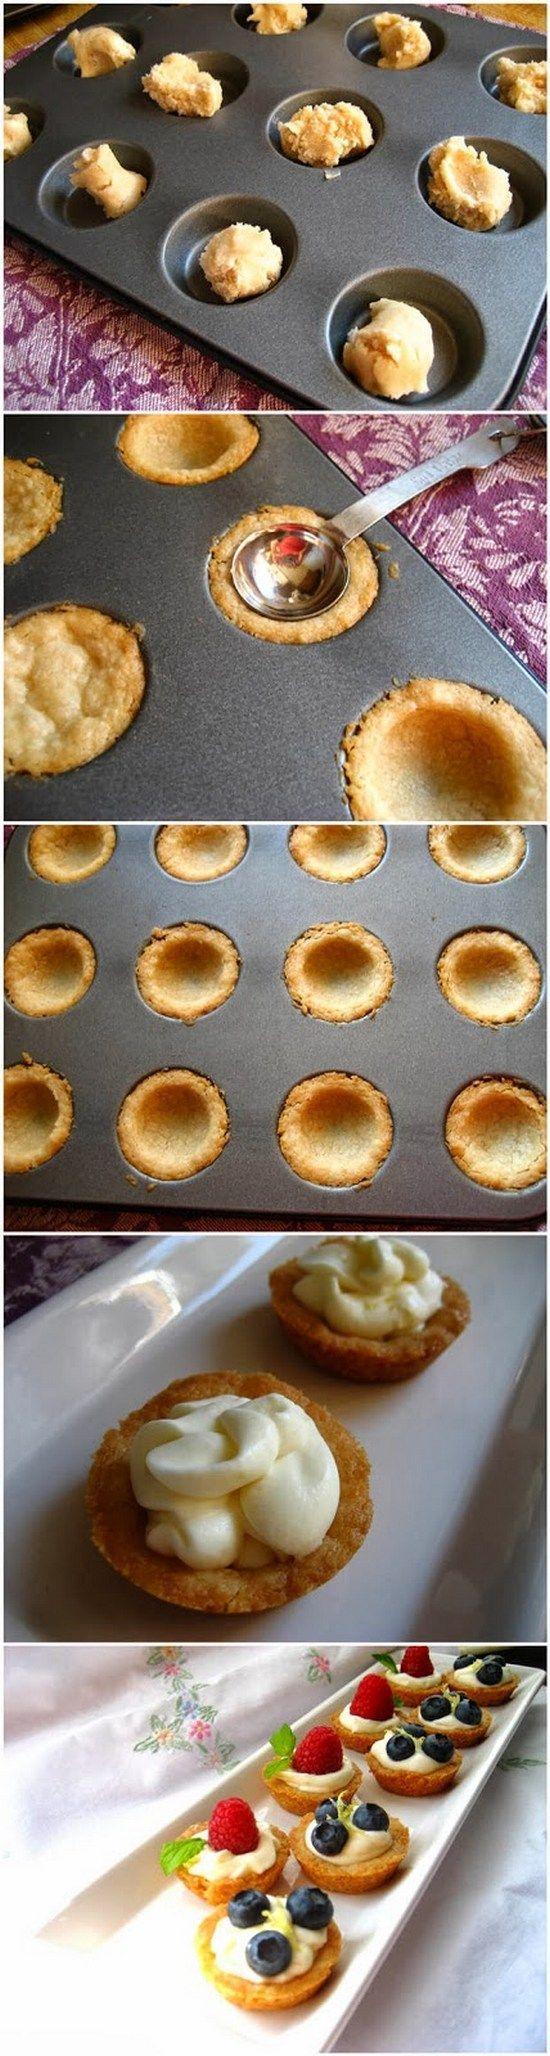 healthy fruit and nut bar recipe mini fruit tart recipe